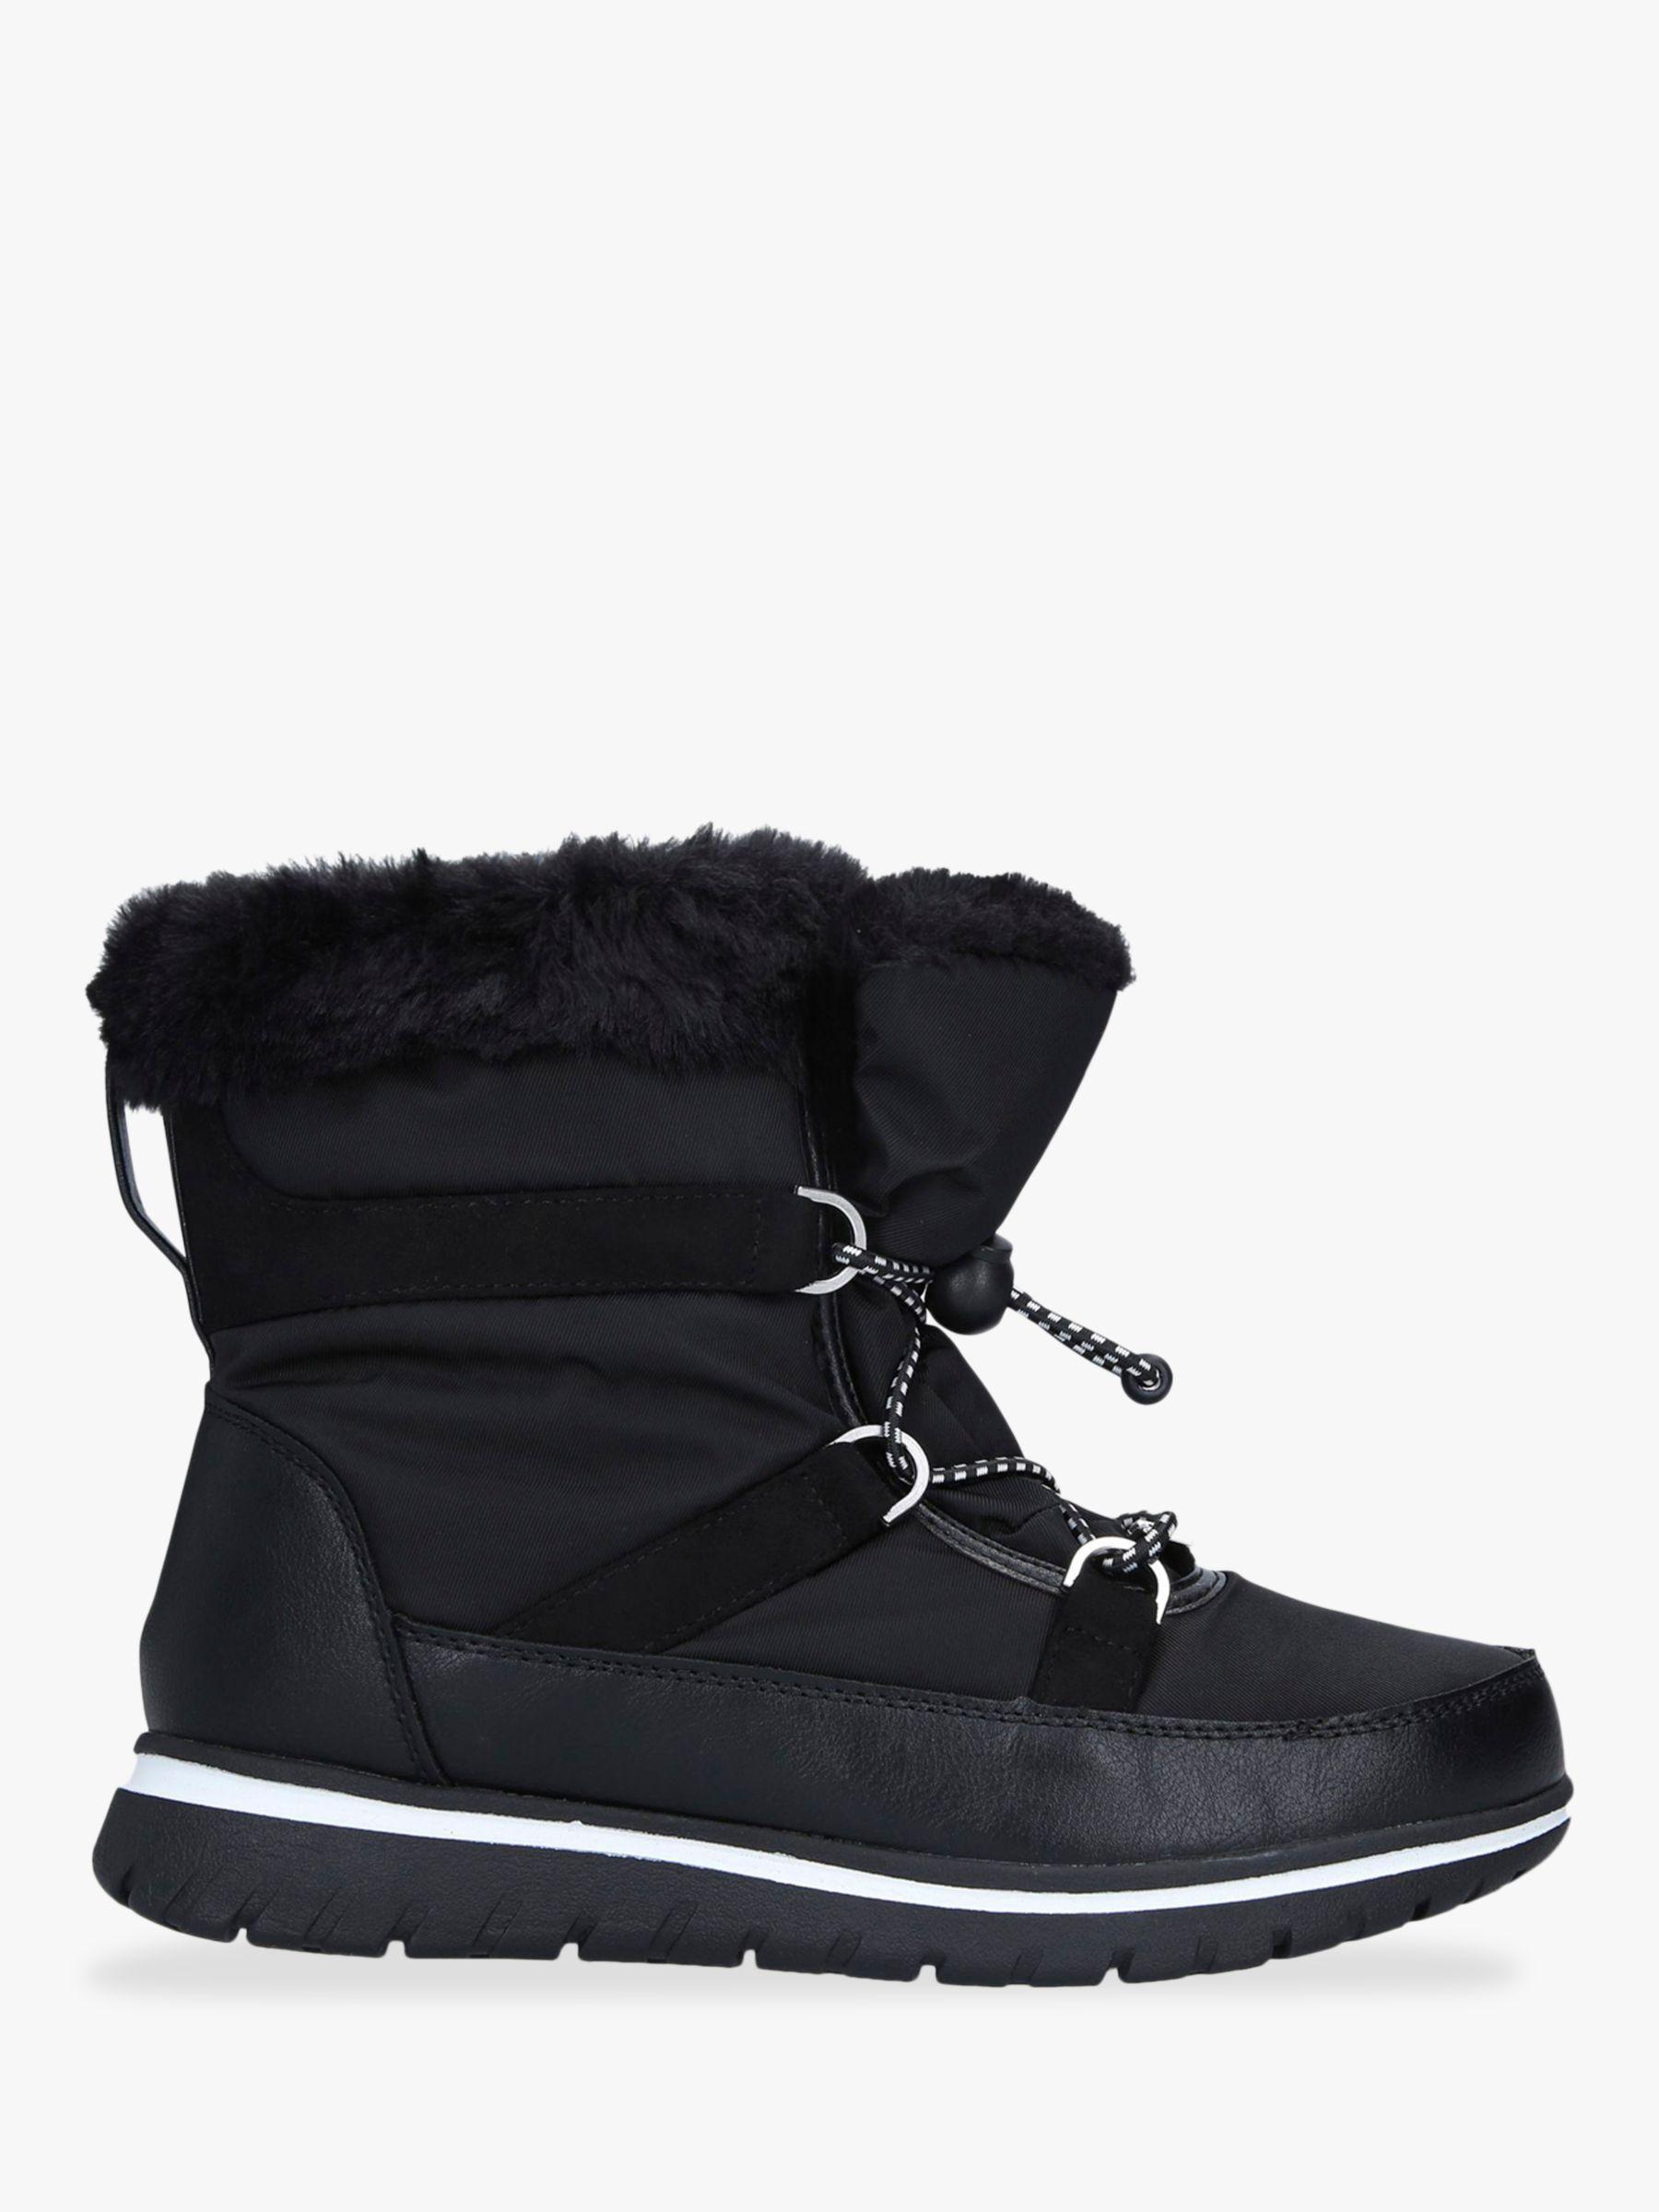 Carvela Comfort Carvela Comfort Ruby Drawstring Snow Boots, Black